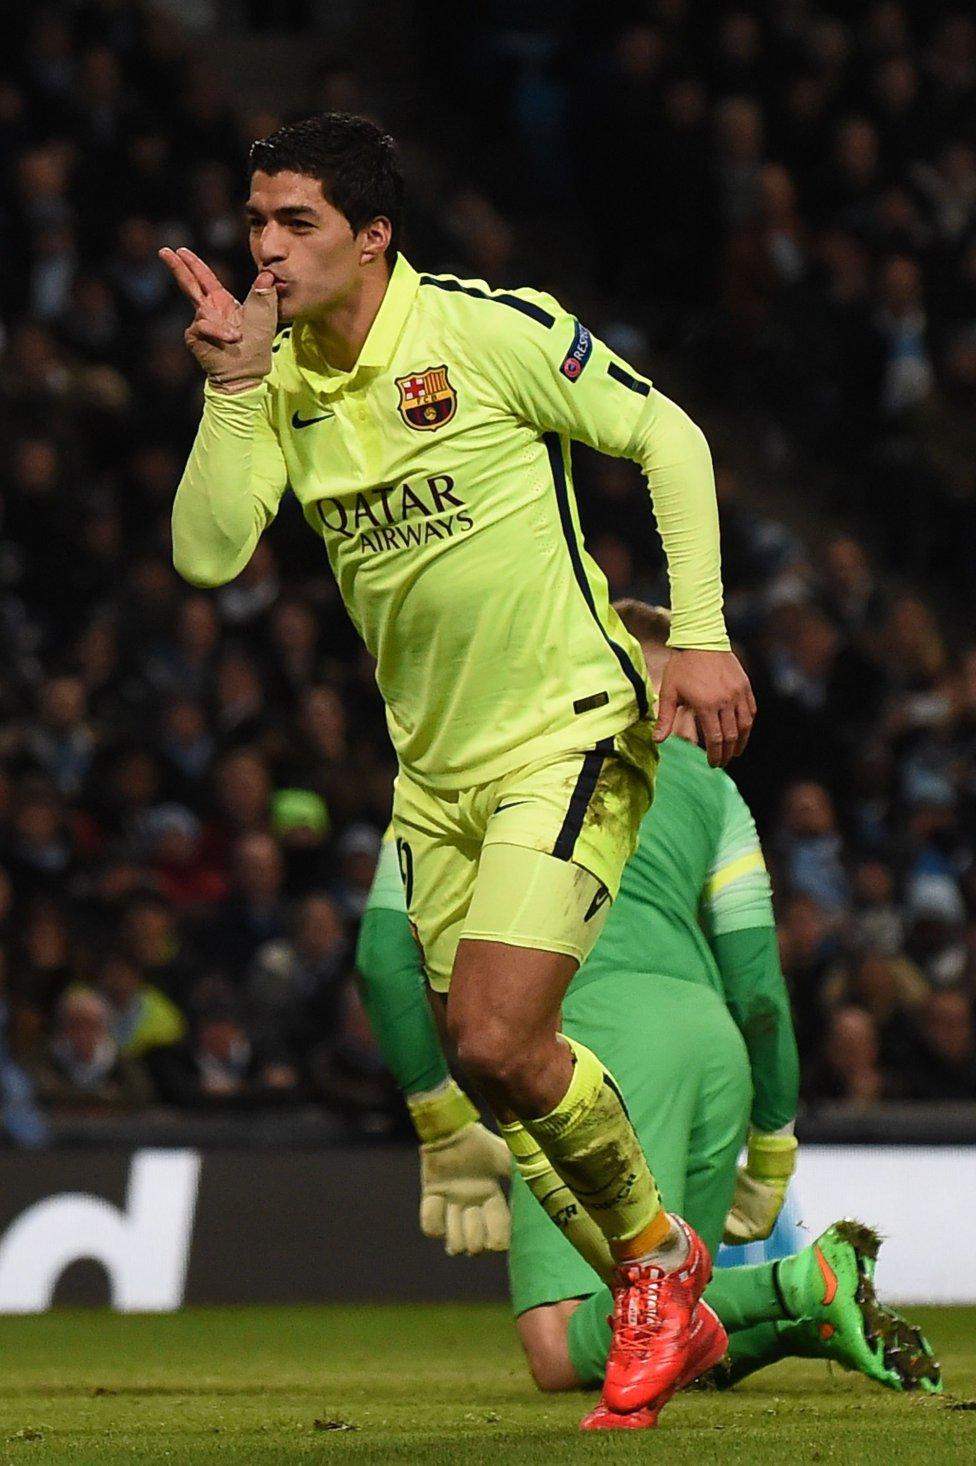 صور : مباراة مانشستر سيتي - برشلونة 1-2 ( 24-02-2015 )  1424809639_812275_1424810180_album_grande